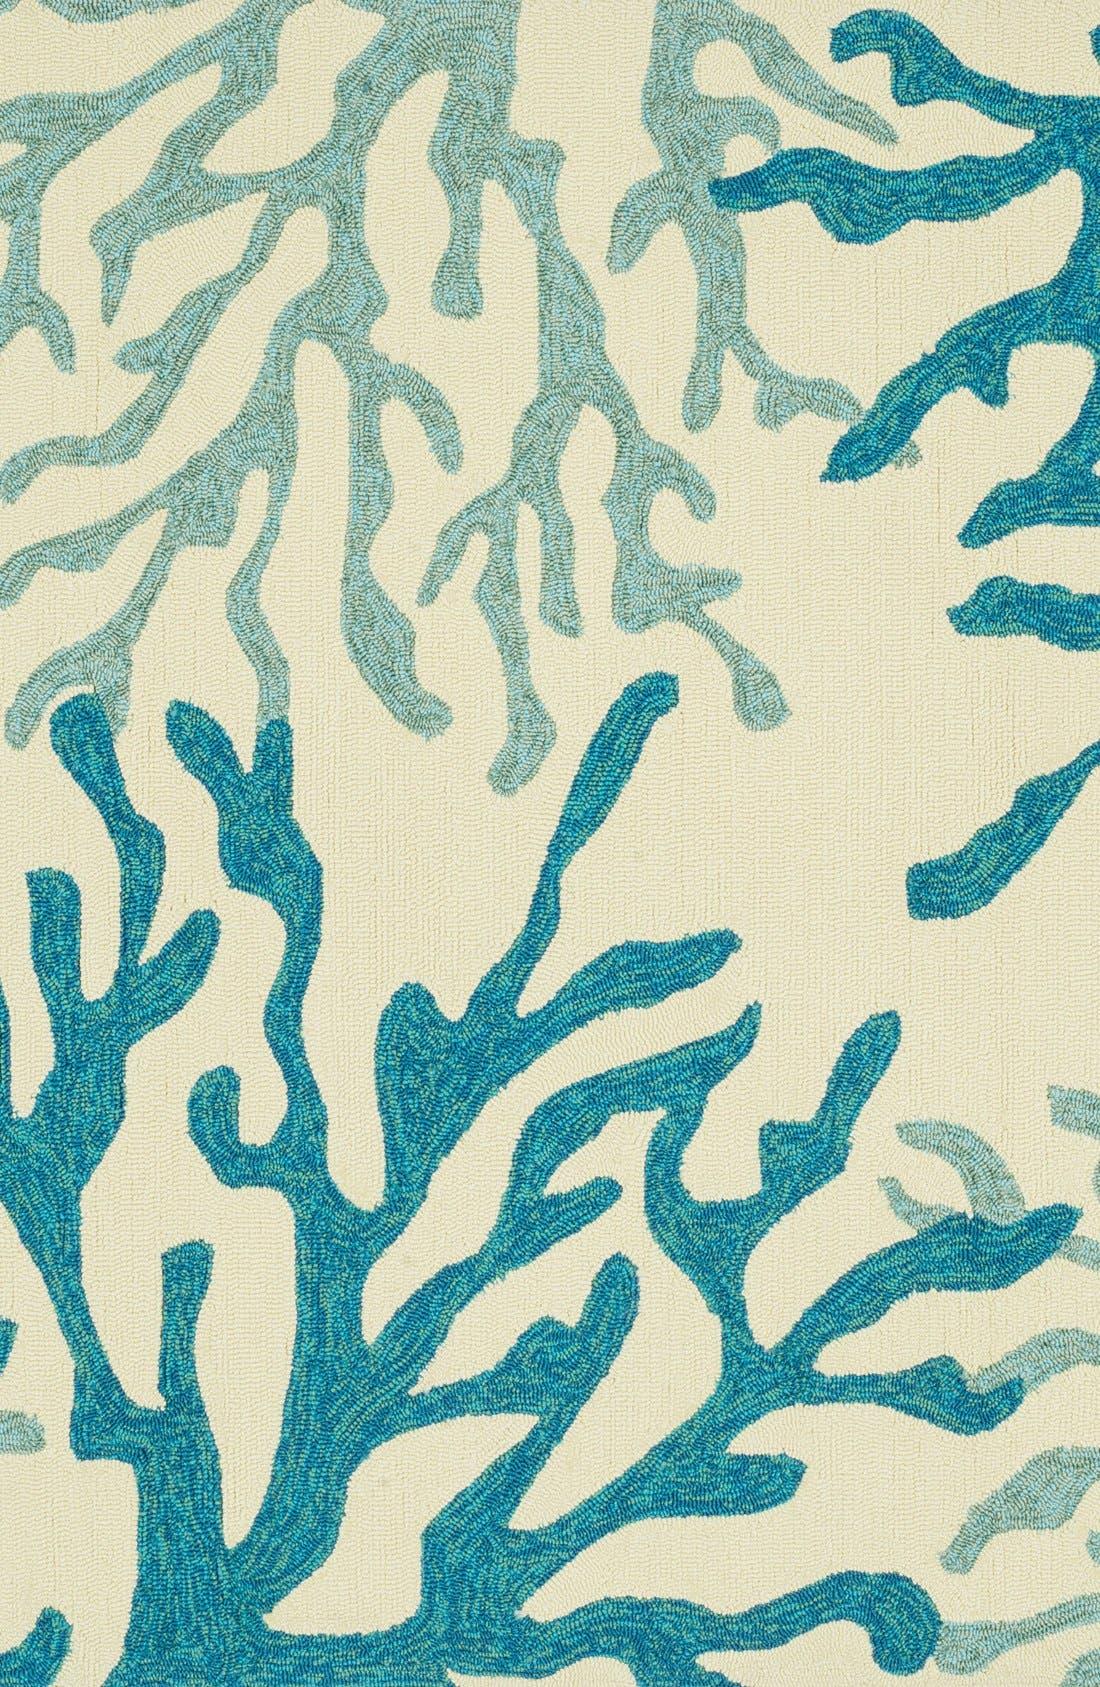 Alternate Image 1 Selected - Loloi 'Ventura Coral' Hank Hooked Indoor/Outdoor Rug